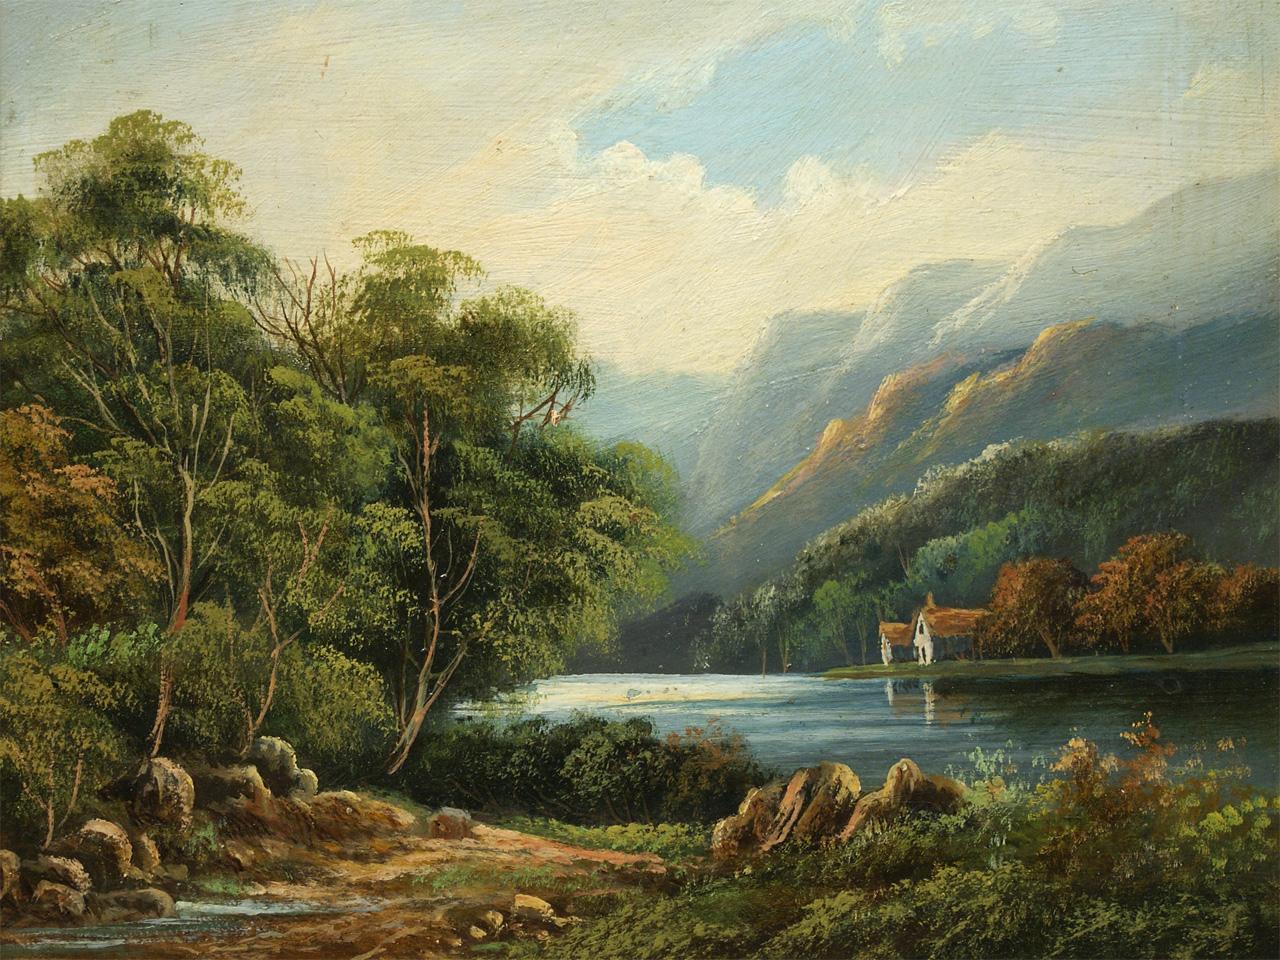 Landschaftsmalerei barock  Art.Nr. G25 Ölgemälde, Landschaftsmalerei, um 1900 – Antiquitäten ...